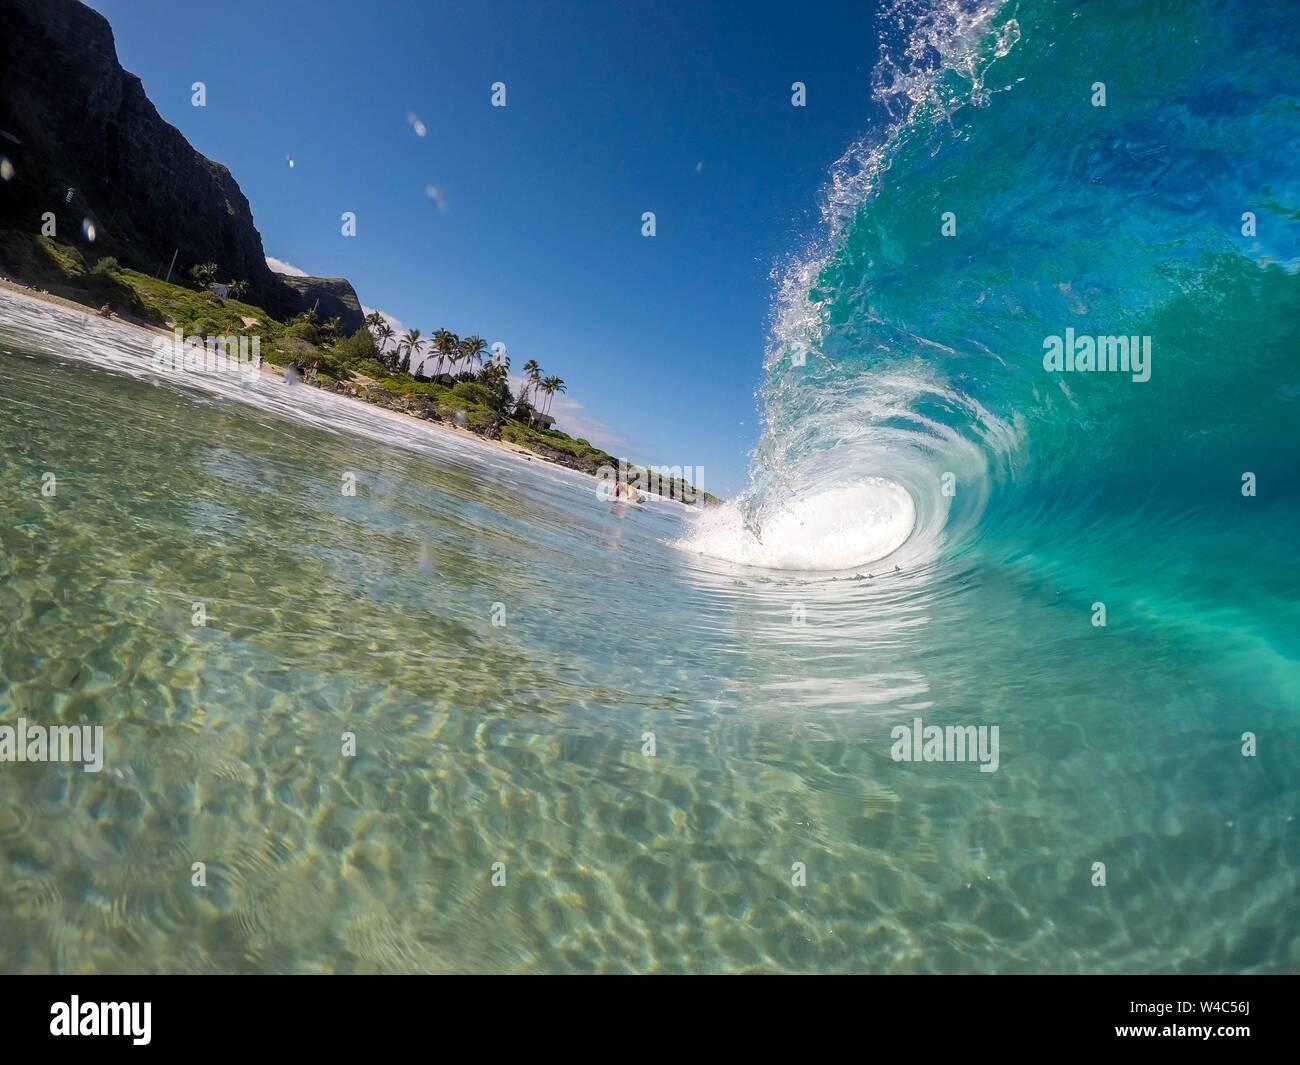 A Beautiful Closeup Shot Of Amazing Strong Ocean Waves In